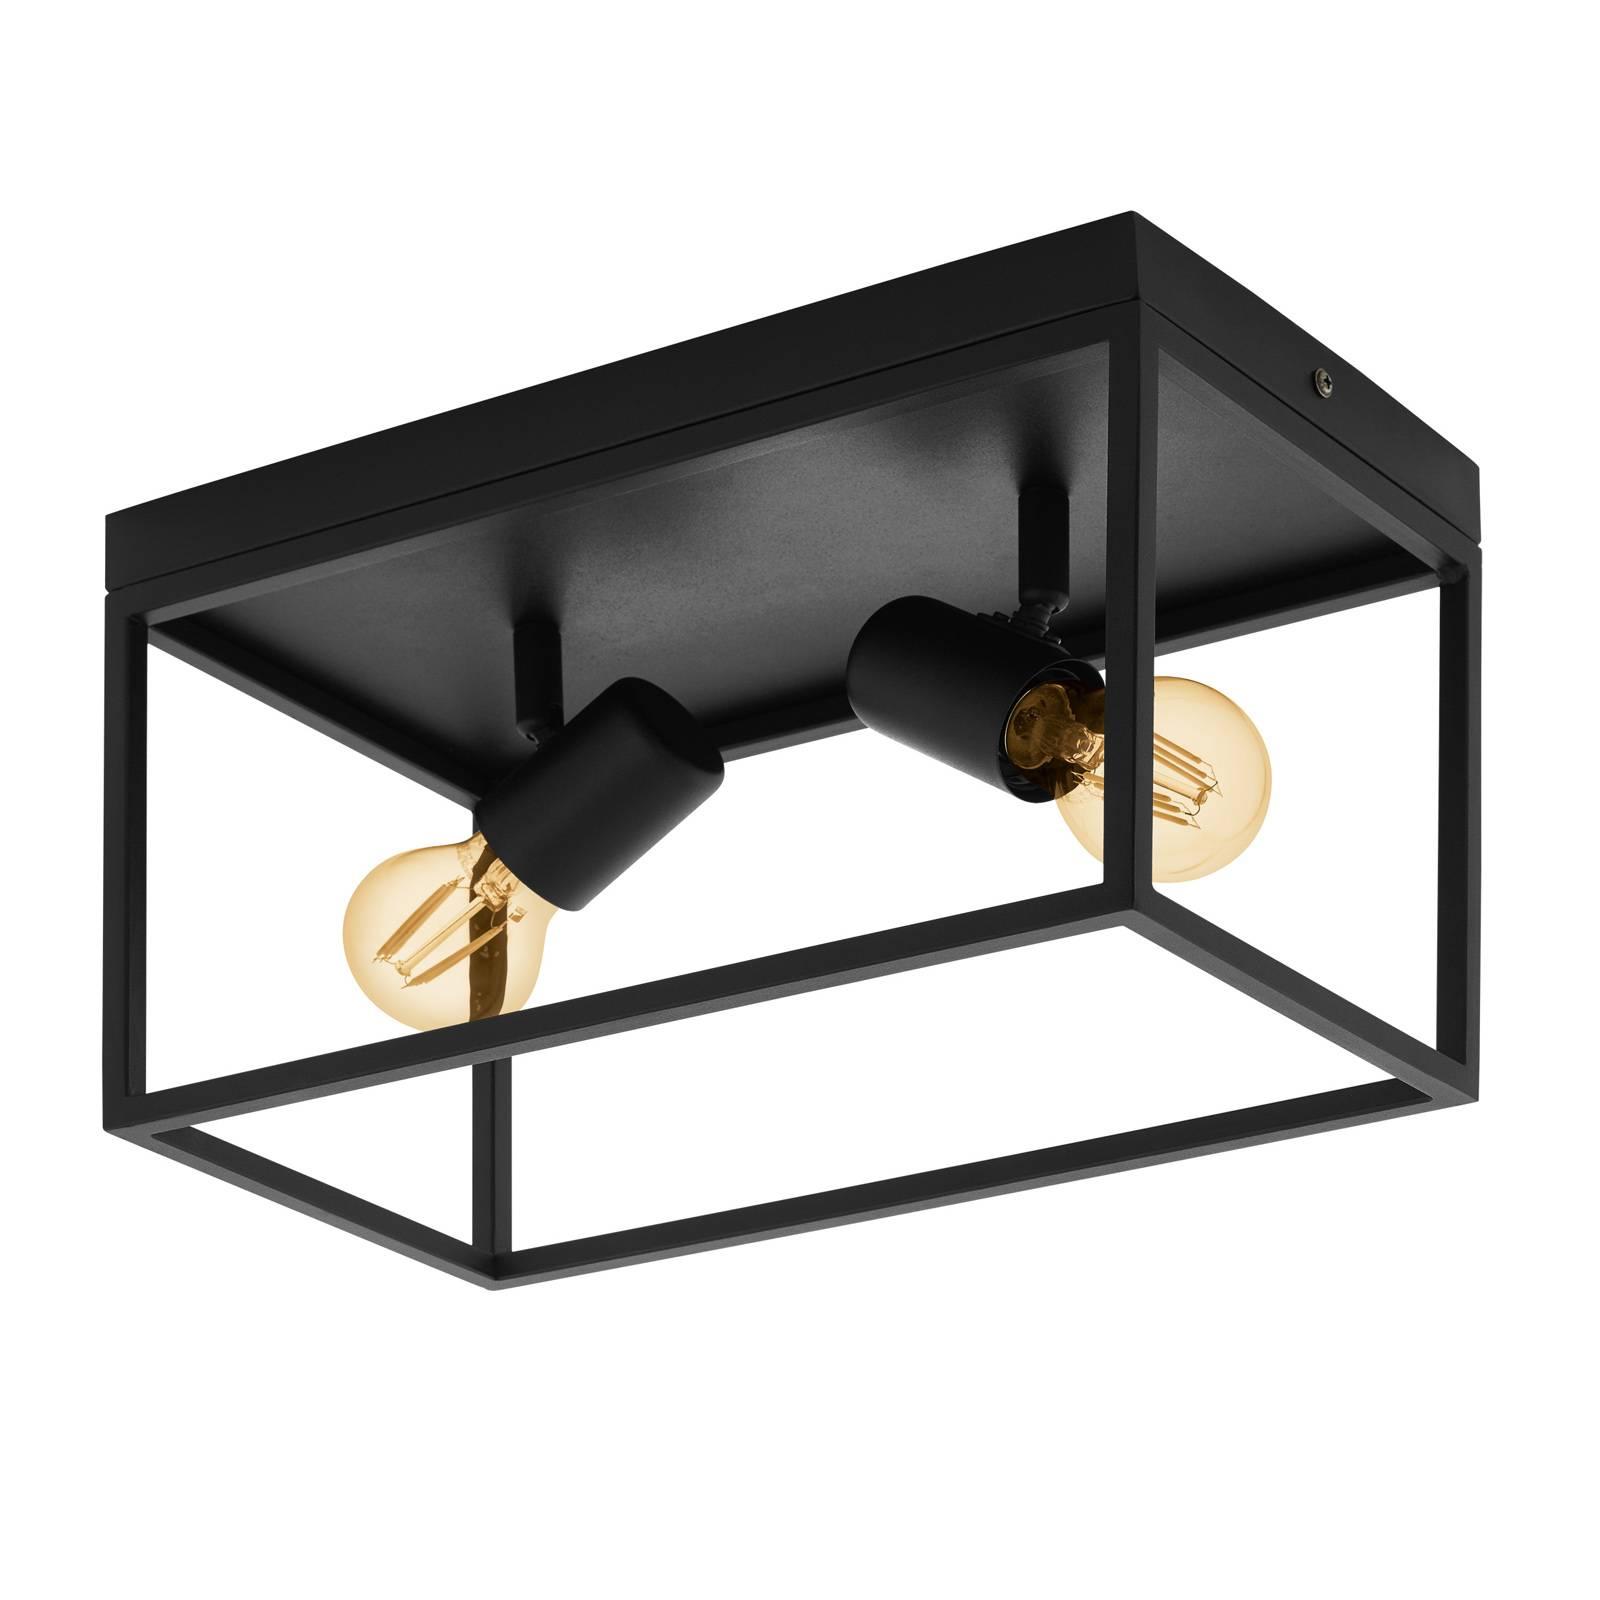 Lampa sufitowa Silentina 2-punktowa, 36x18cm